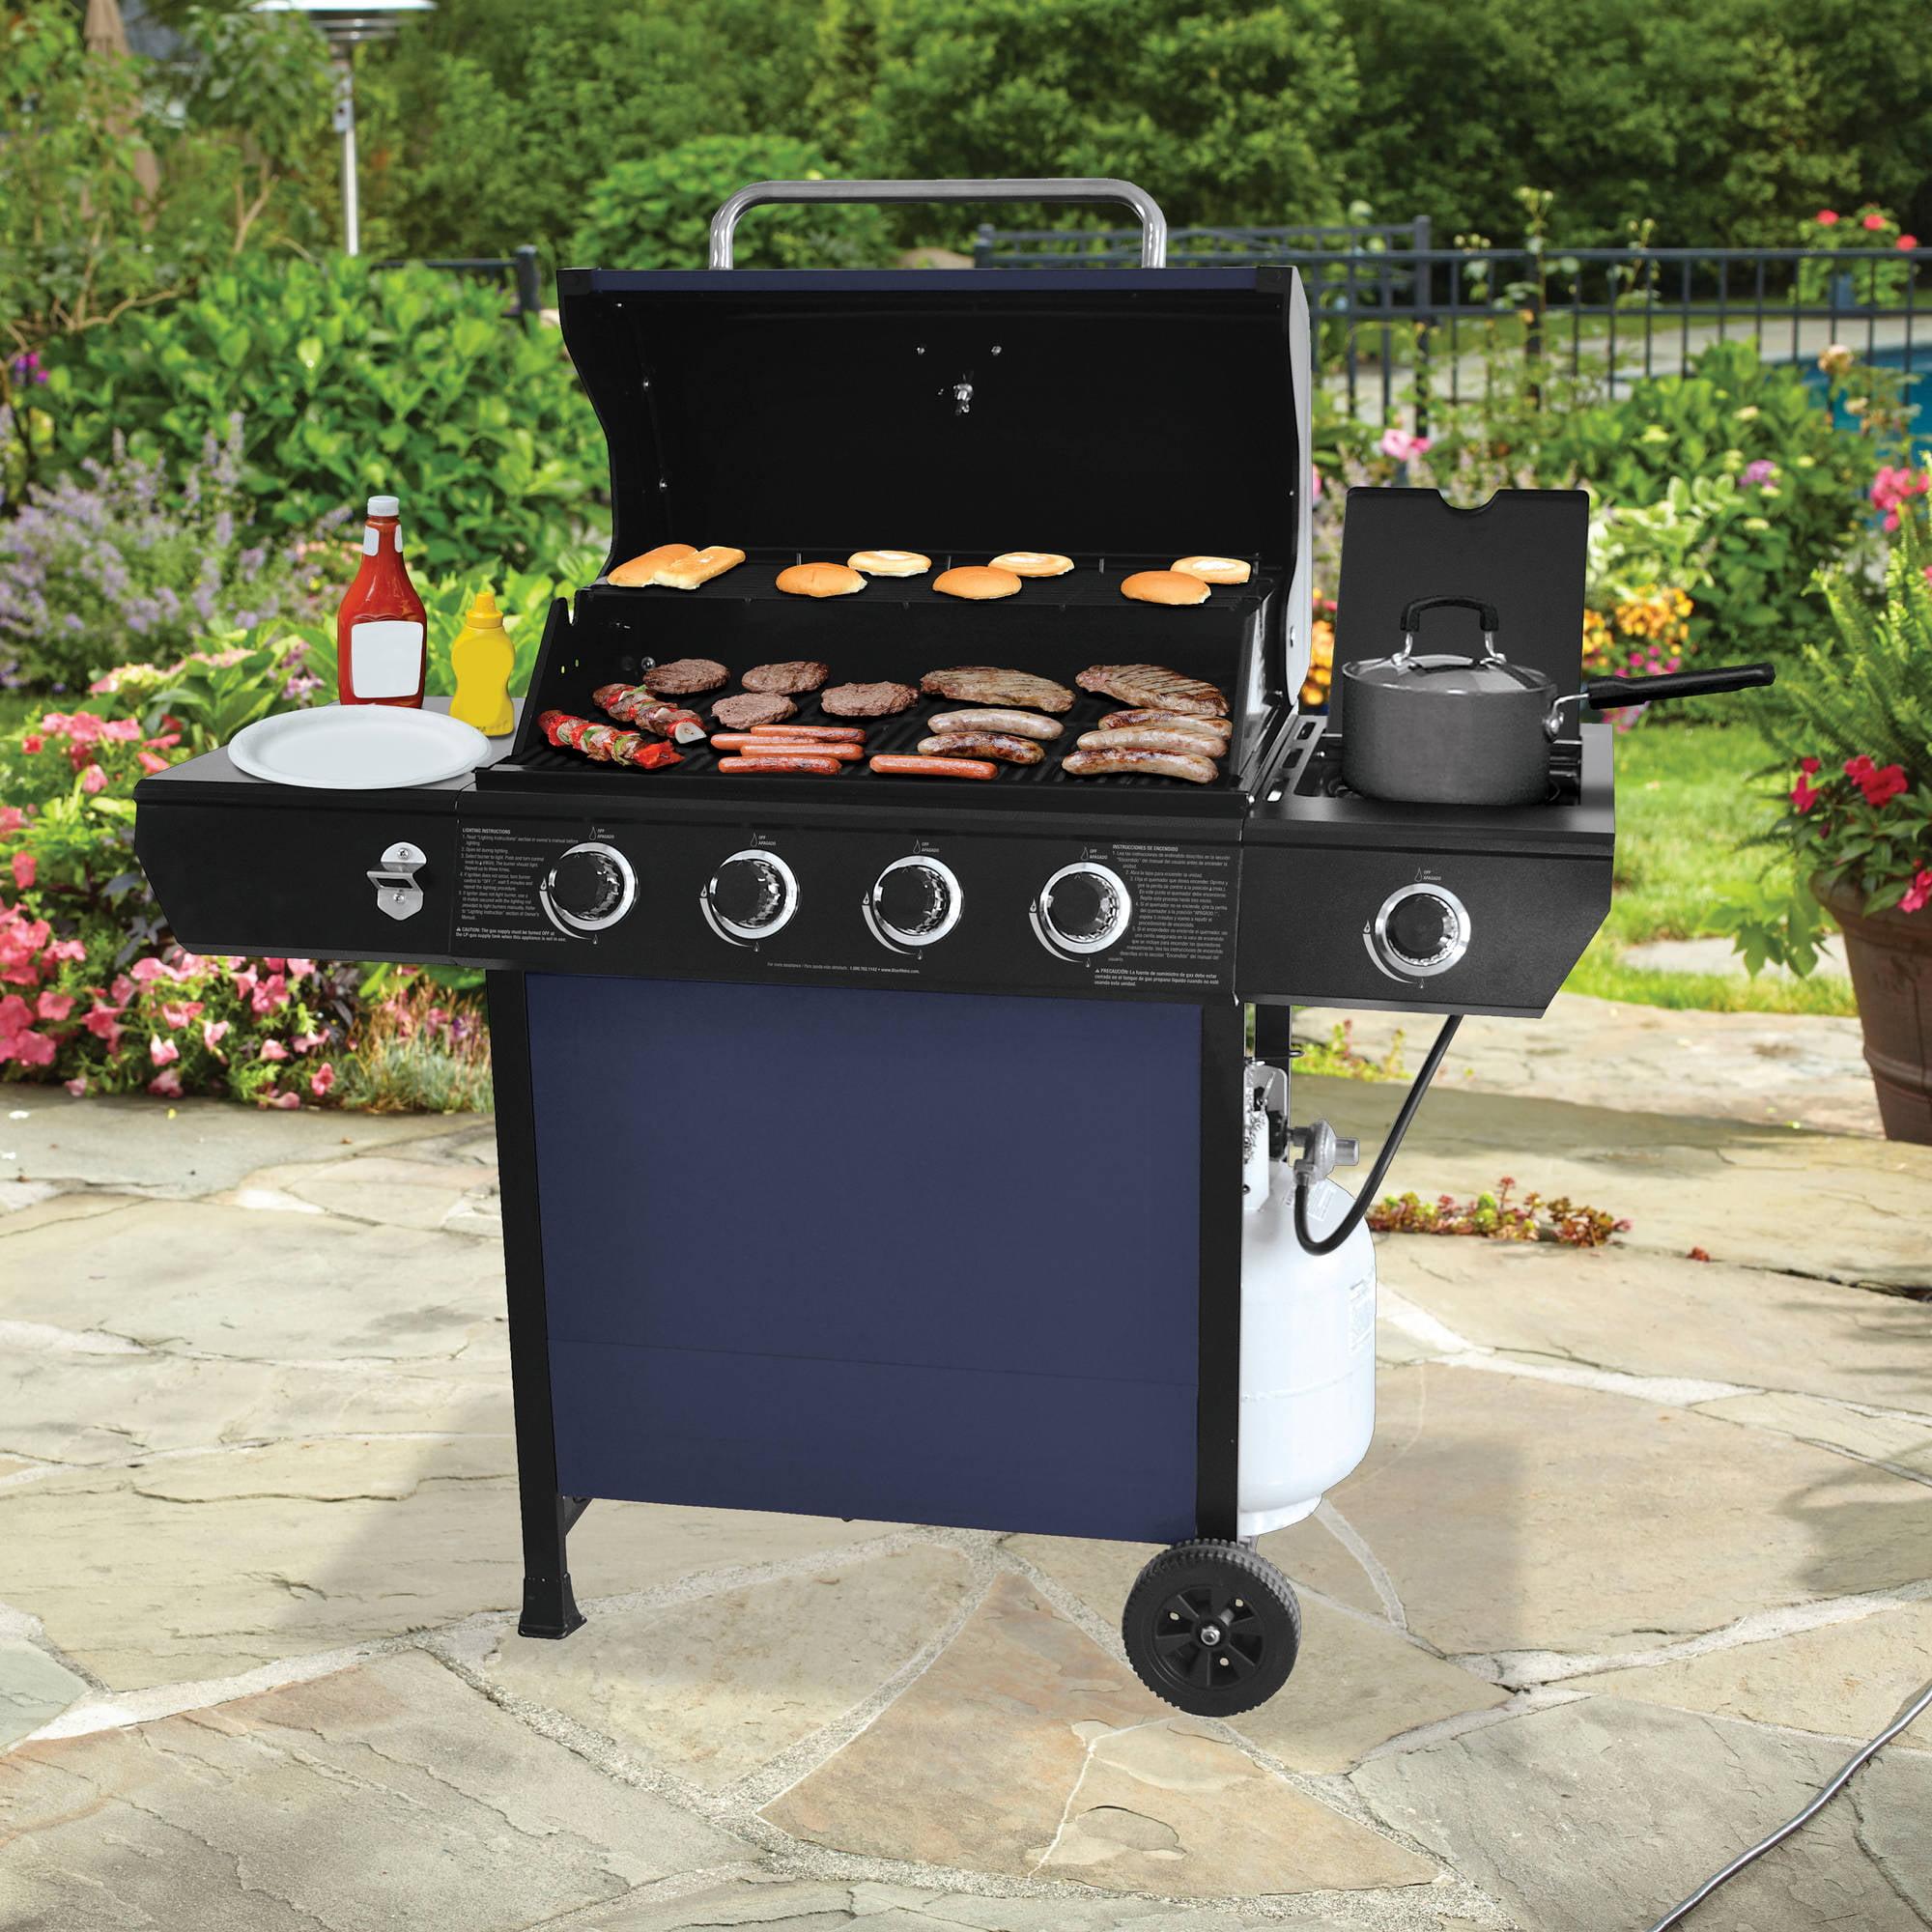 Walmart Backyard Grill 4 Burner backyard grill 4-burner gas grill, blue - walmart